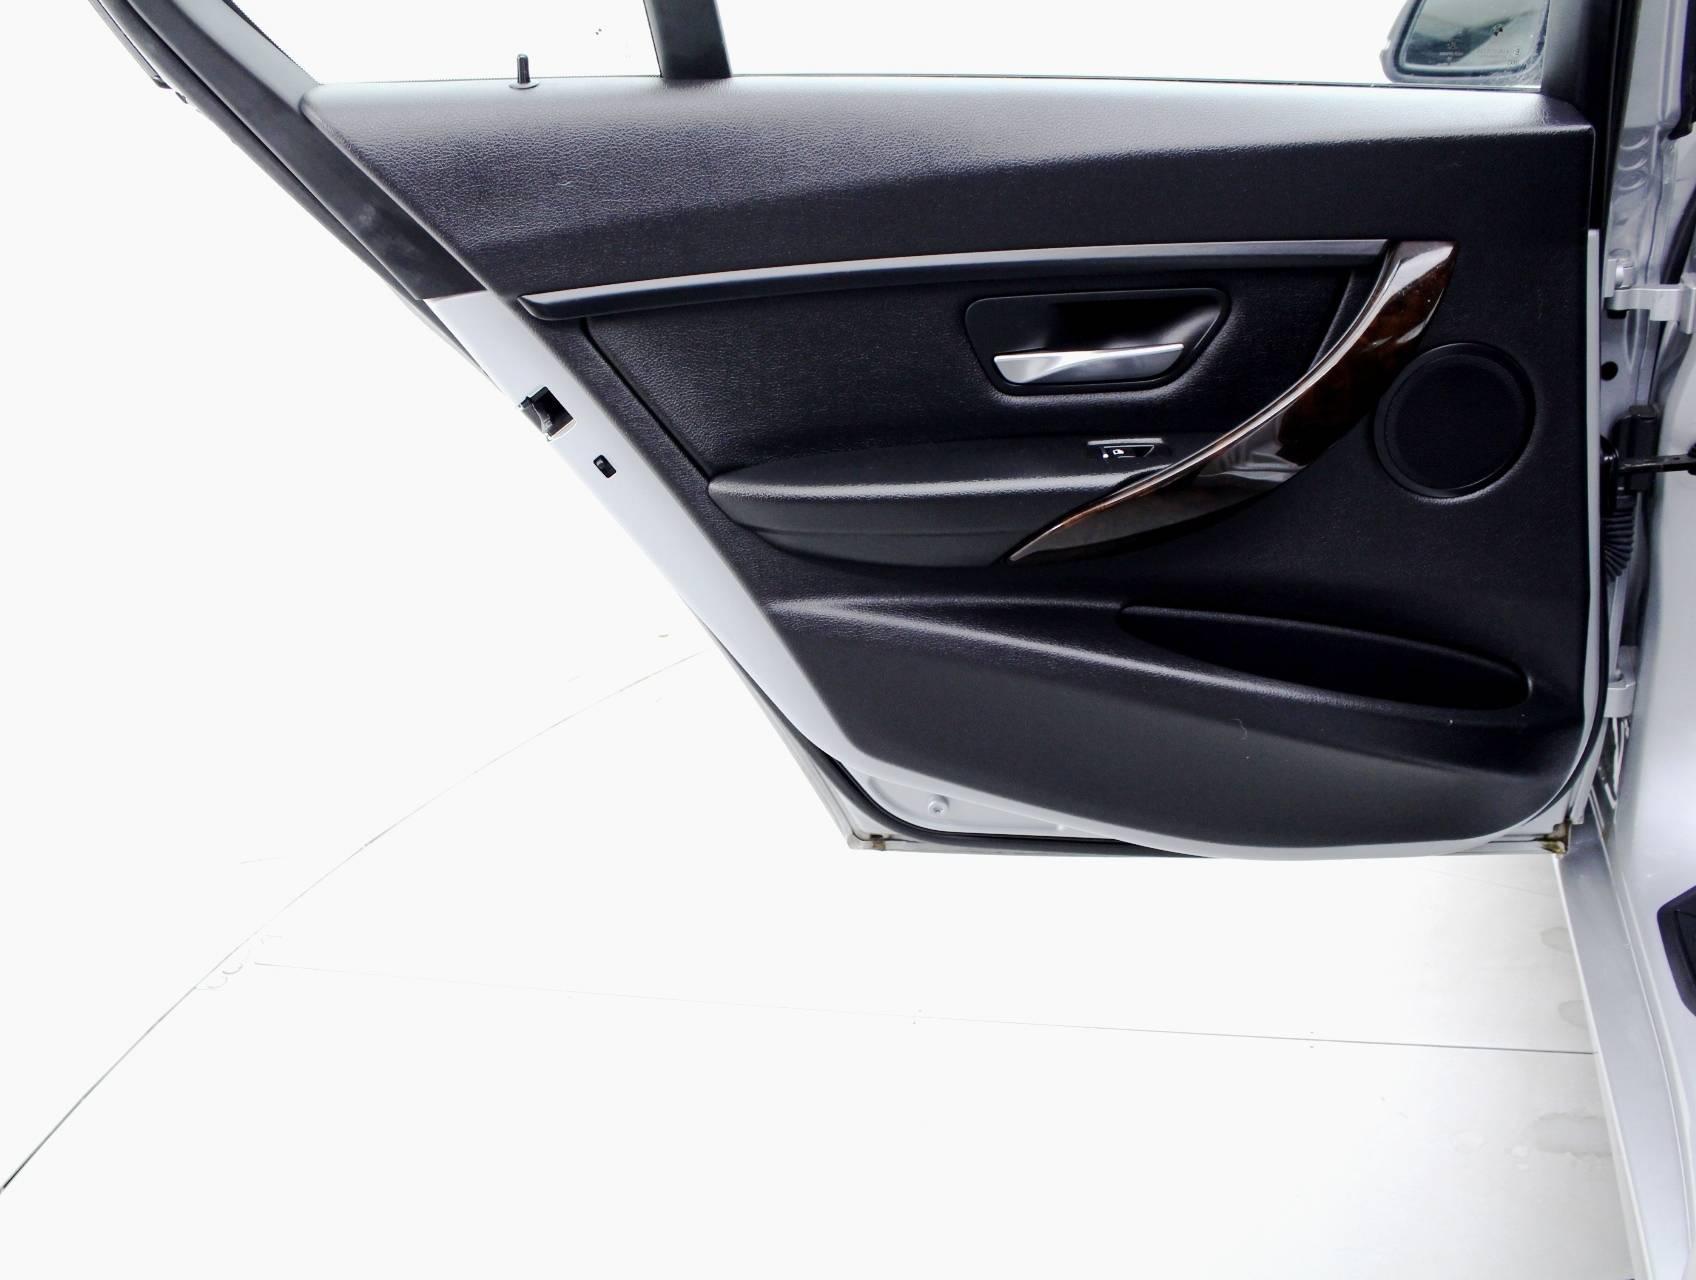 Used 2016 Bmw 3 Series 320i Xdrive Sedan For Sale In Miami